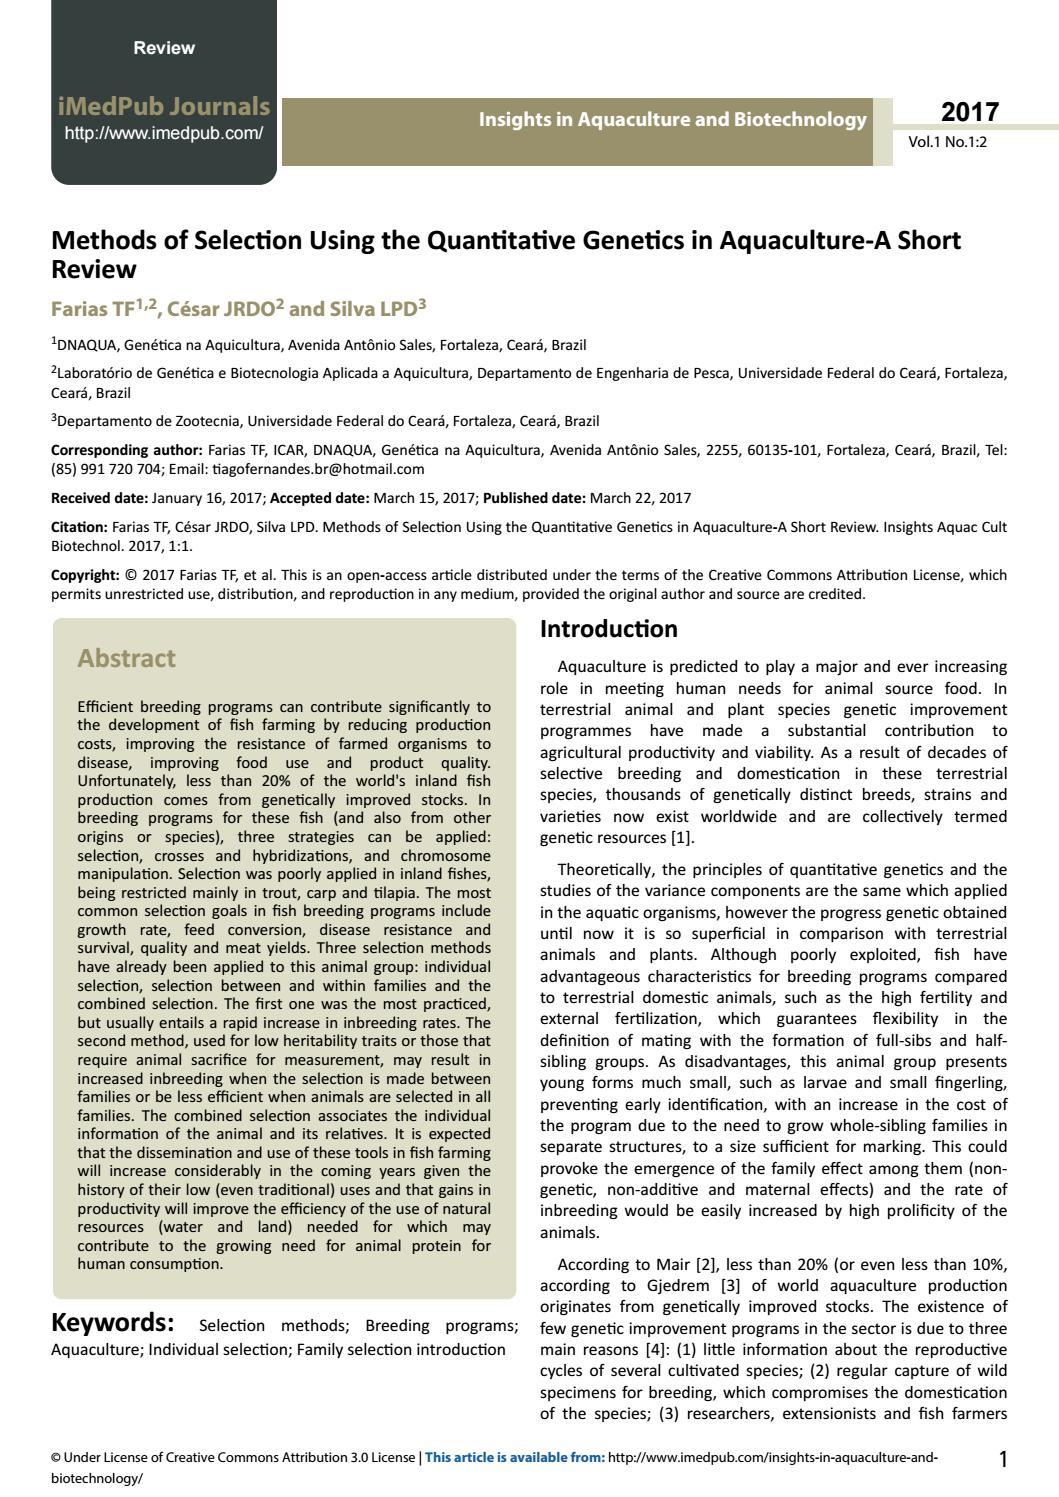 Methods of selection Using the quantitative genetics in